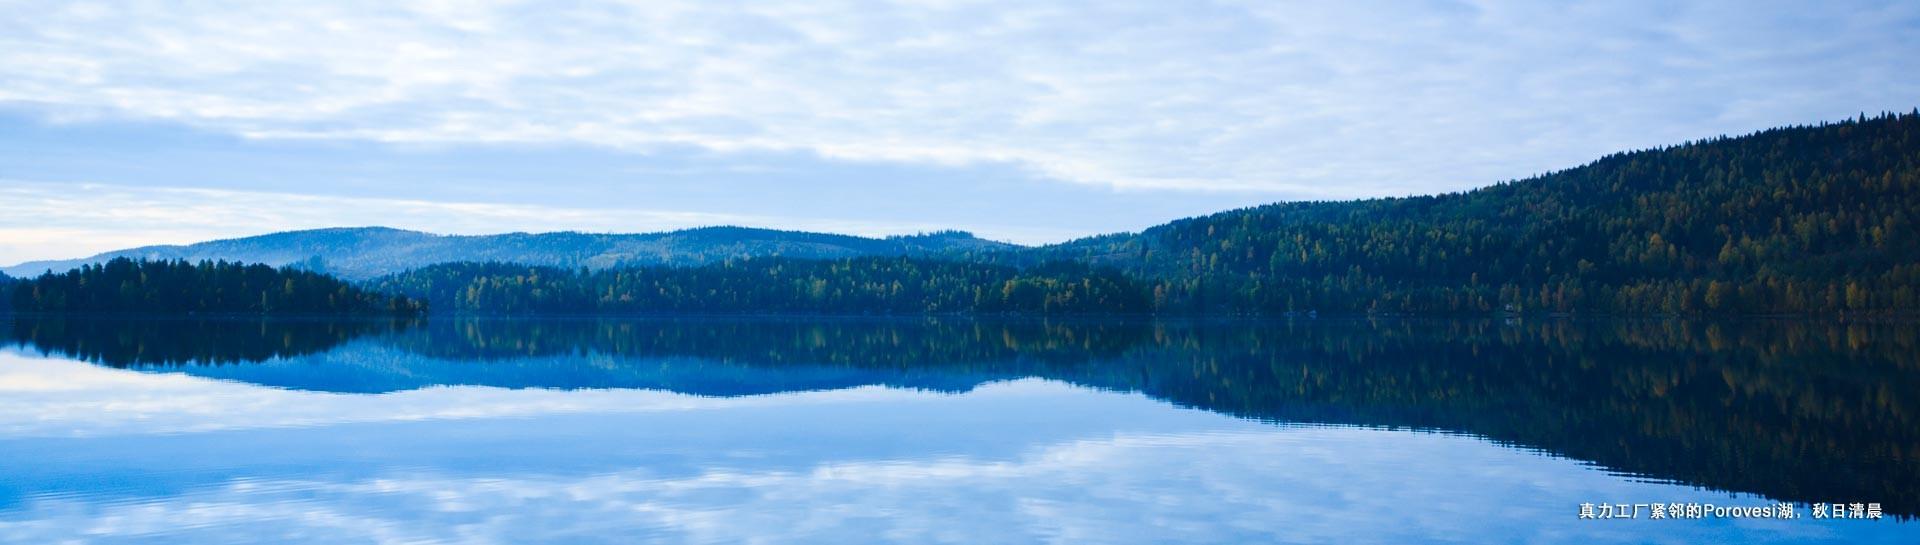 lake-1920-text1